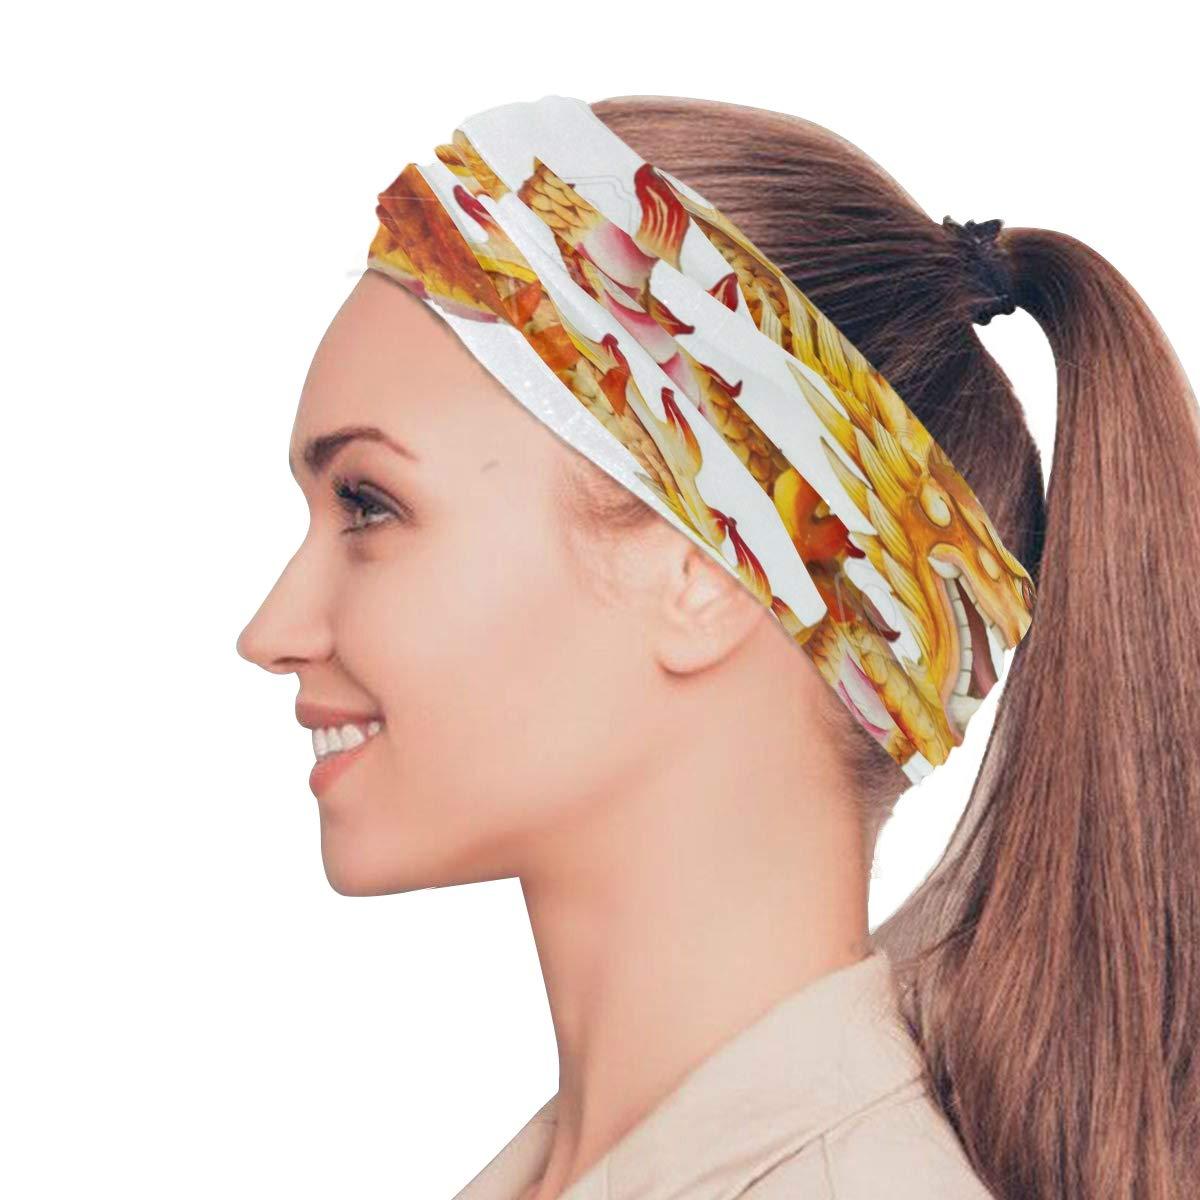 Magic Headwear Long Hair Feathers Outdoor Scarf Headbands Bandana Mask Neck Gaiter Head Wrap Mask Sweatband